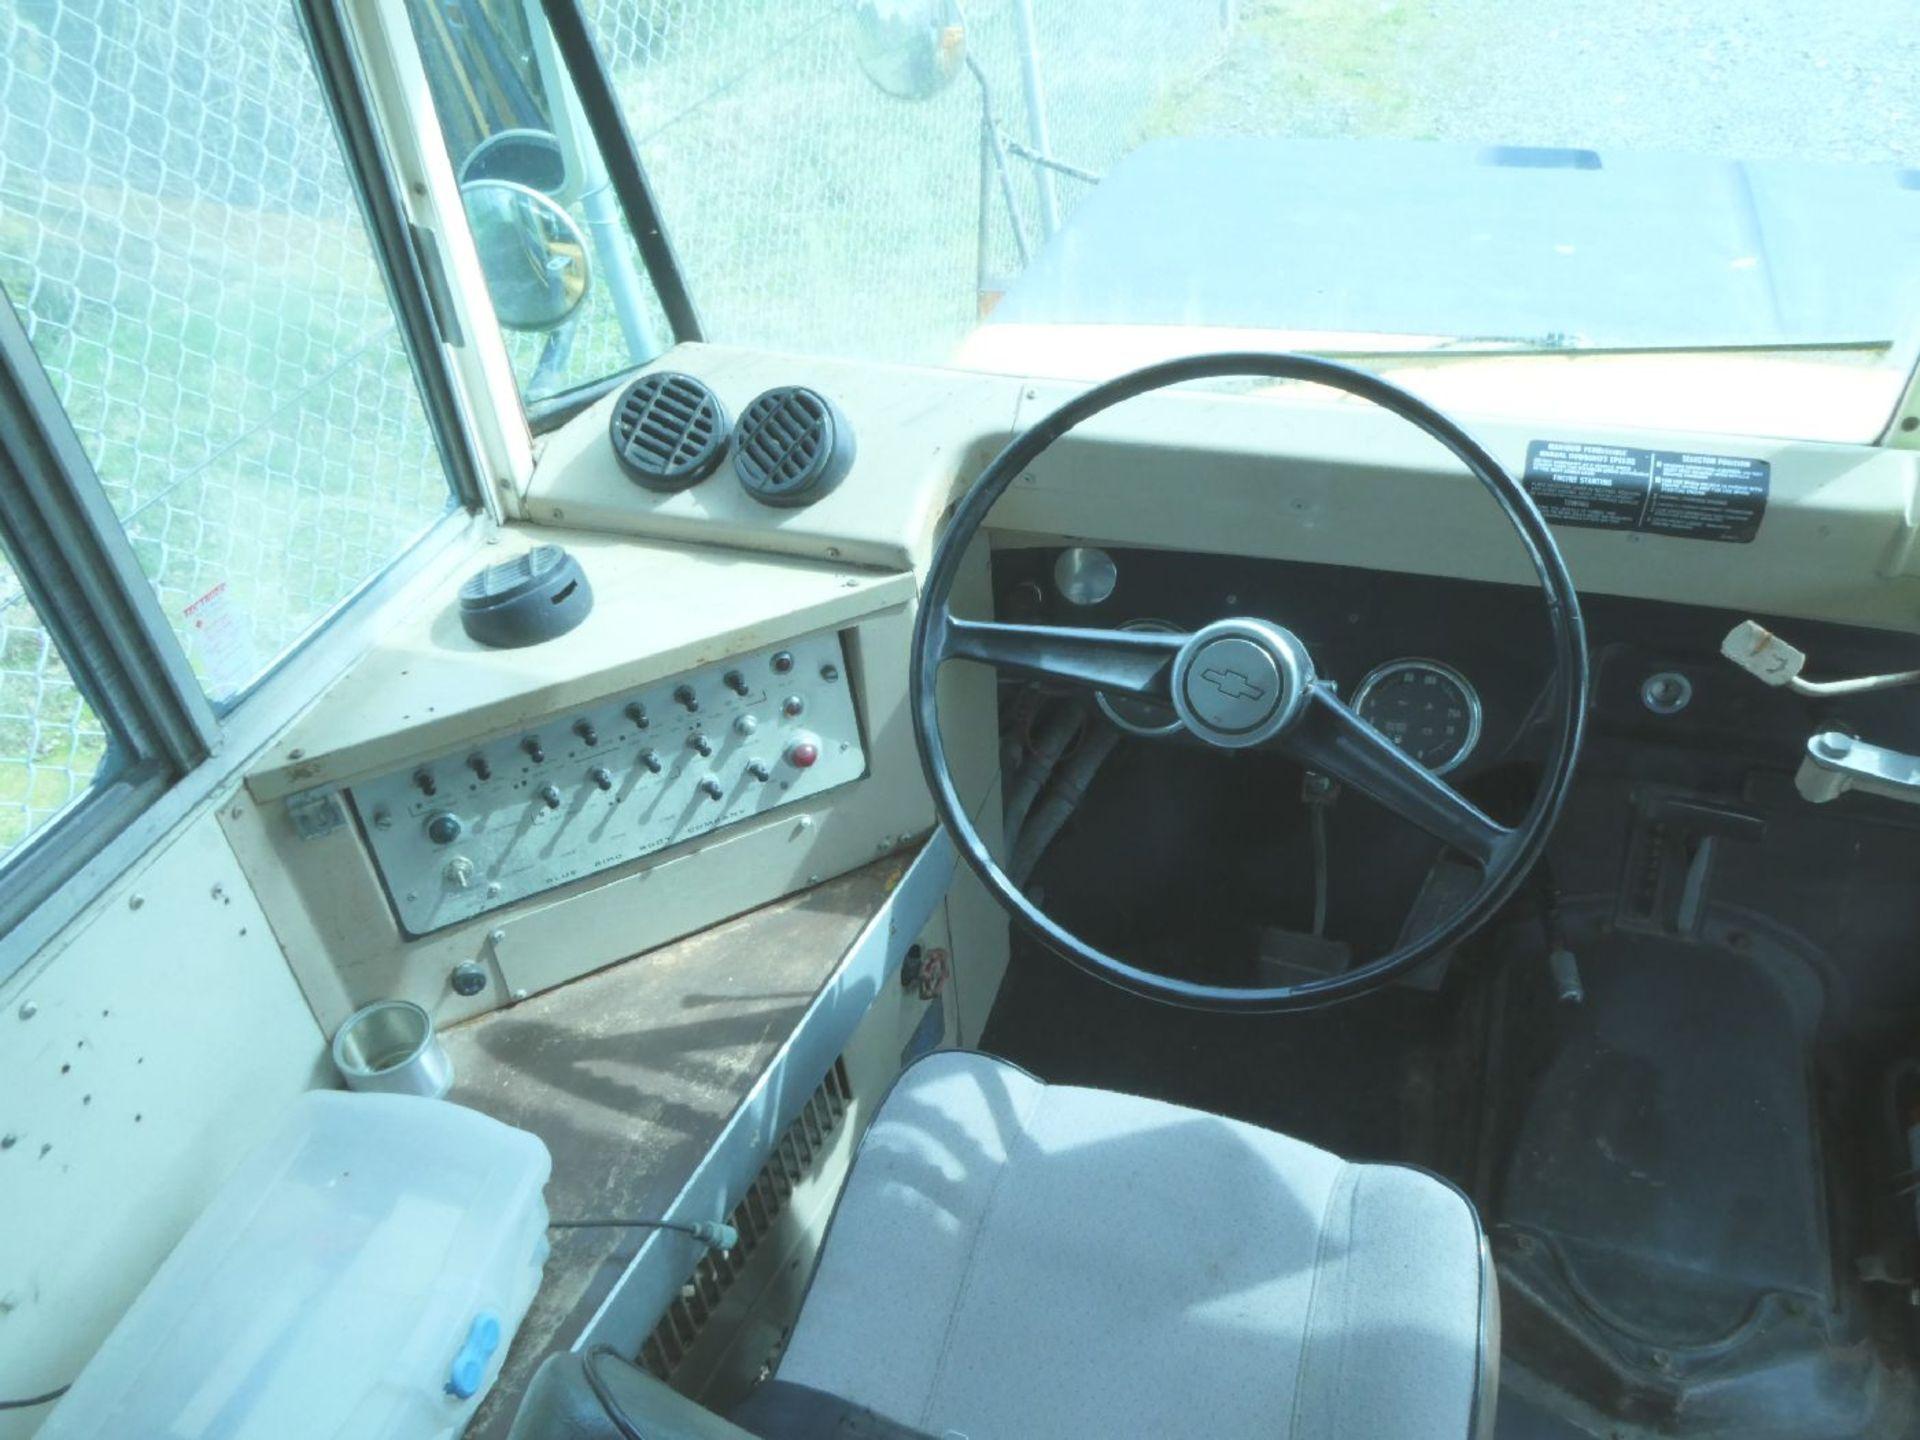 BlueBird School Bus - Image 3 of 4